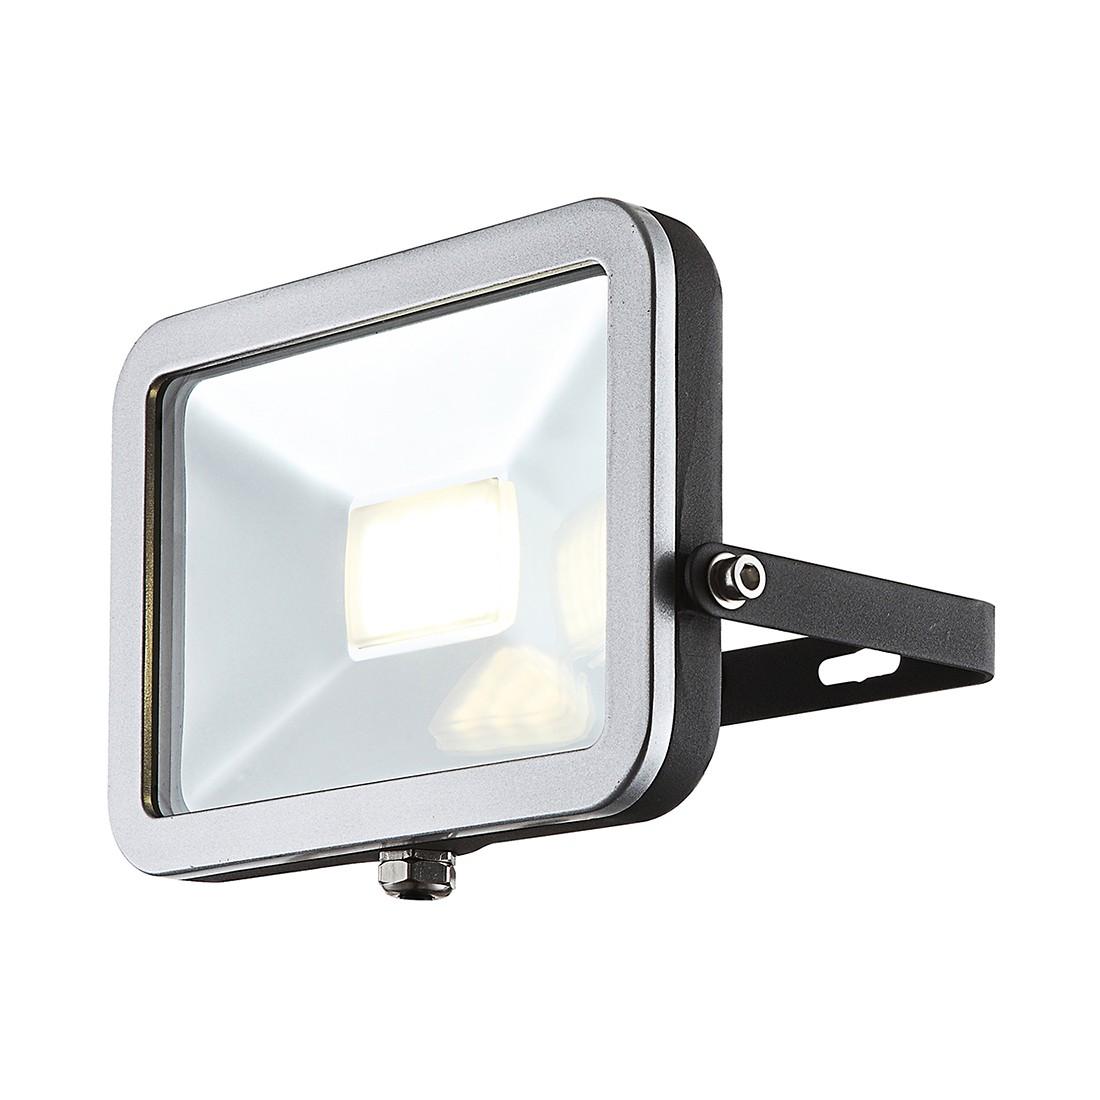 Außenleuchte Construction ● Silber & Grau ● Aluminium Druckguß- Globo Lighting A+